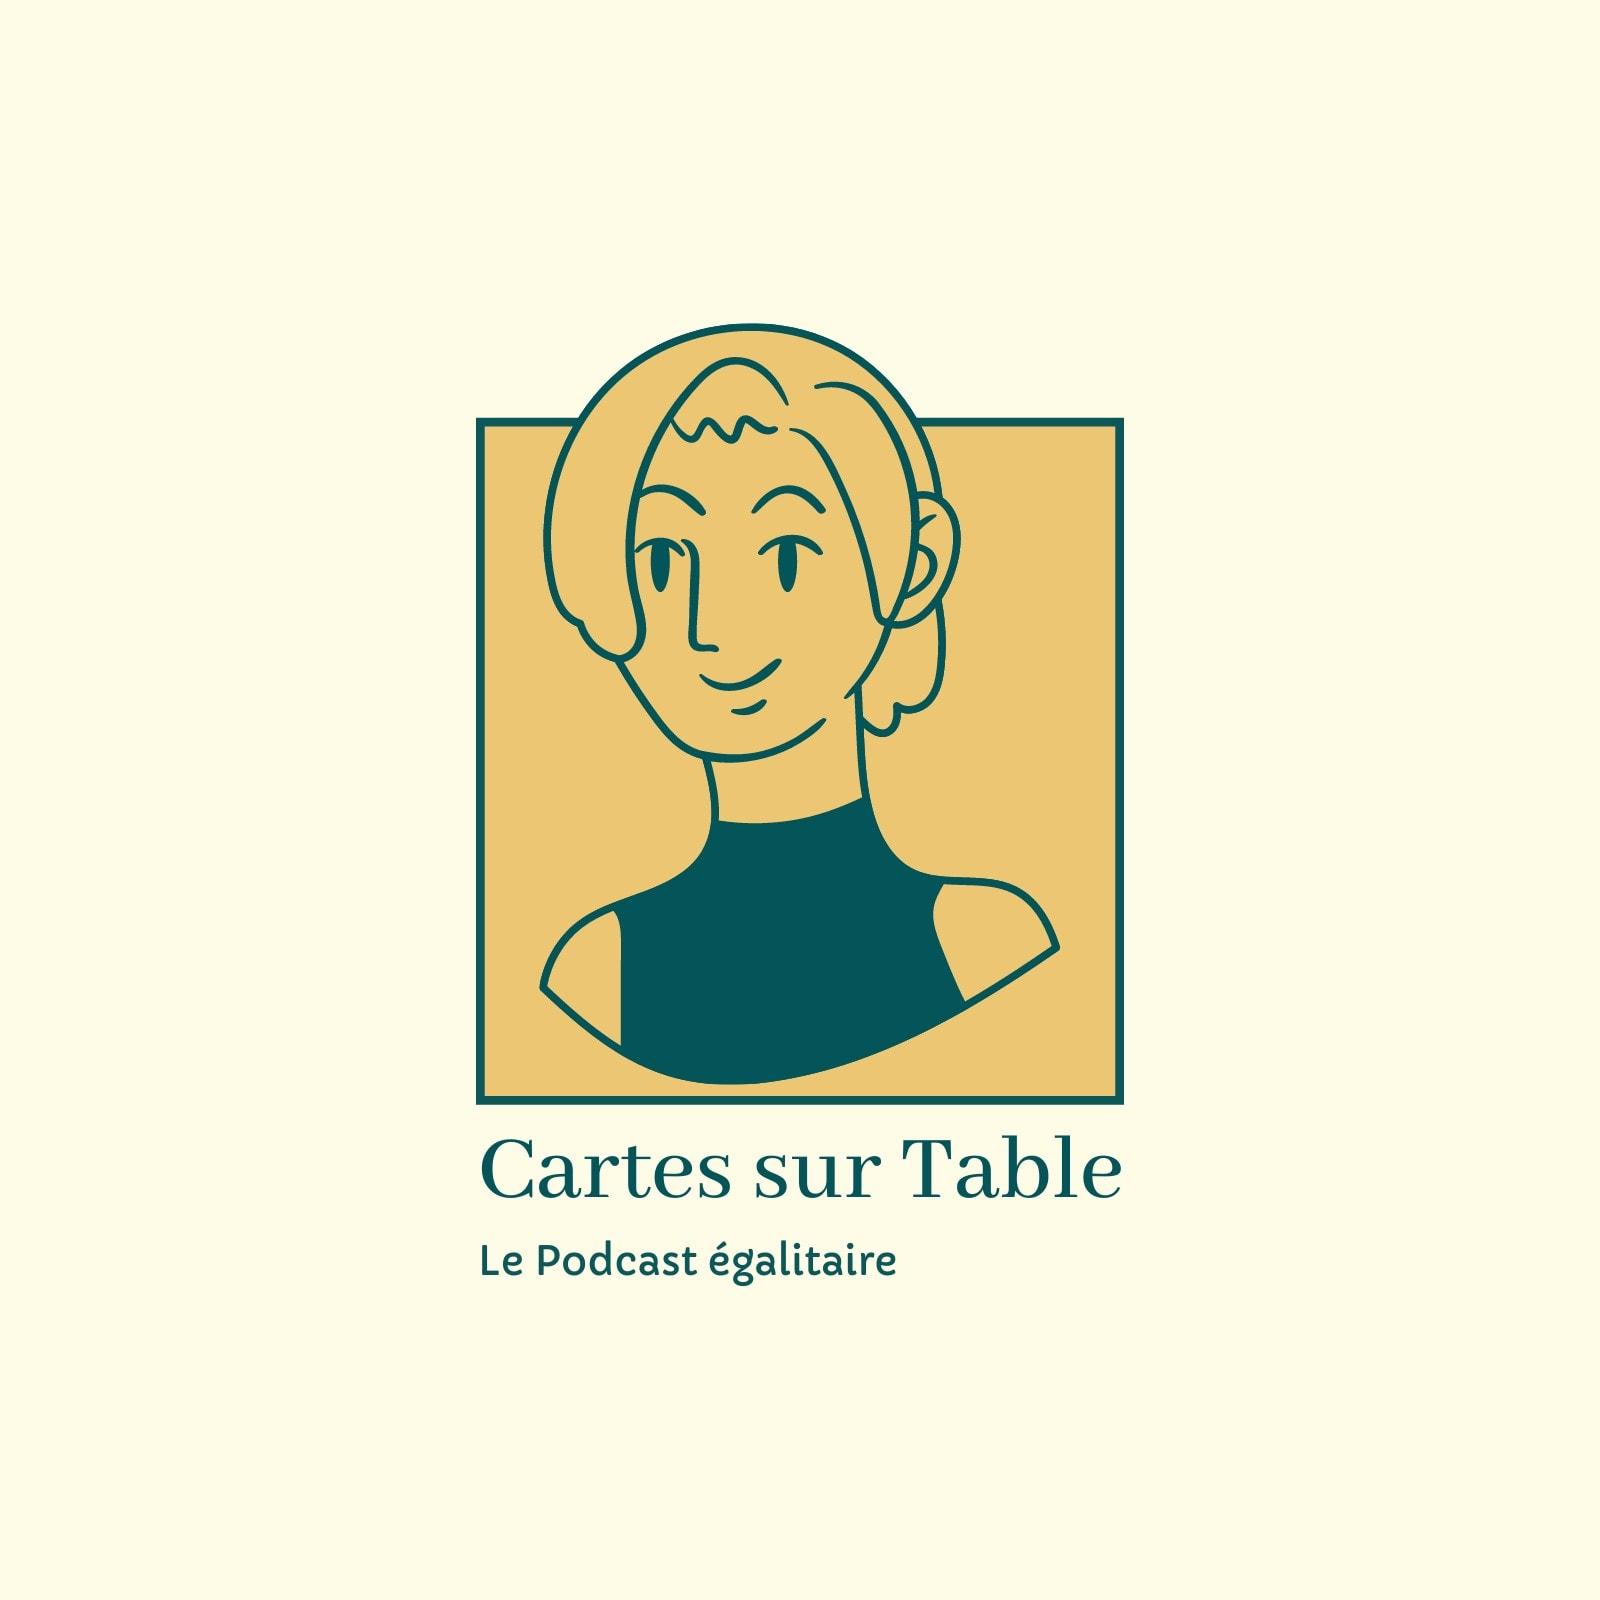 Logo podcast avec femme illustrée bleu et jaune